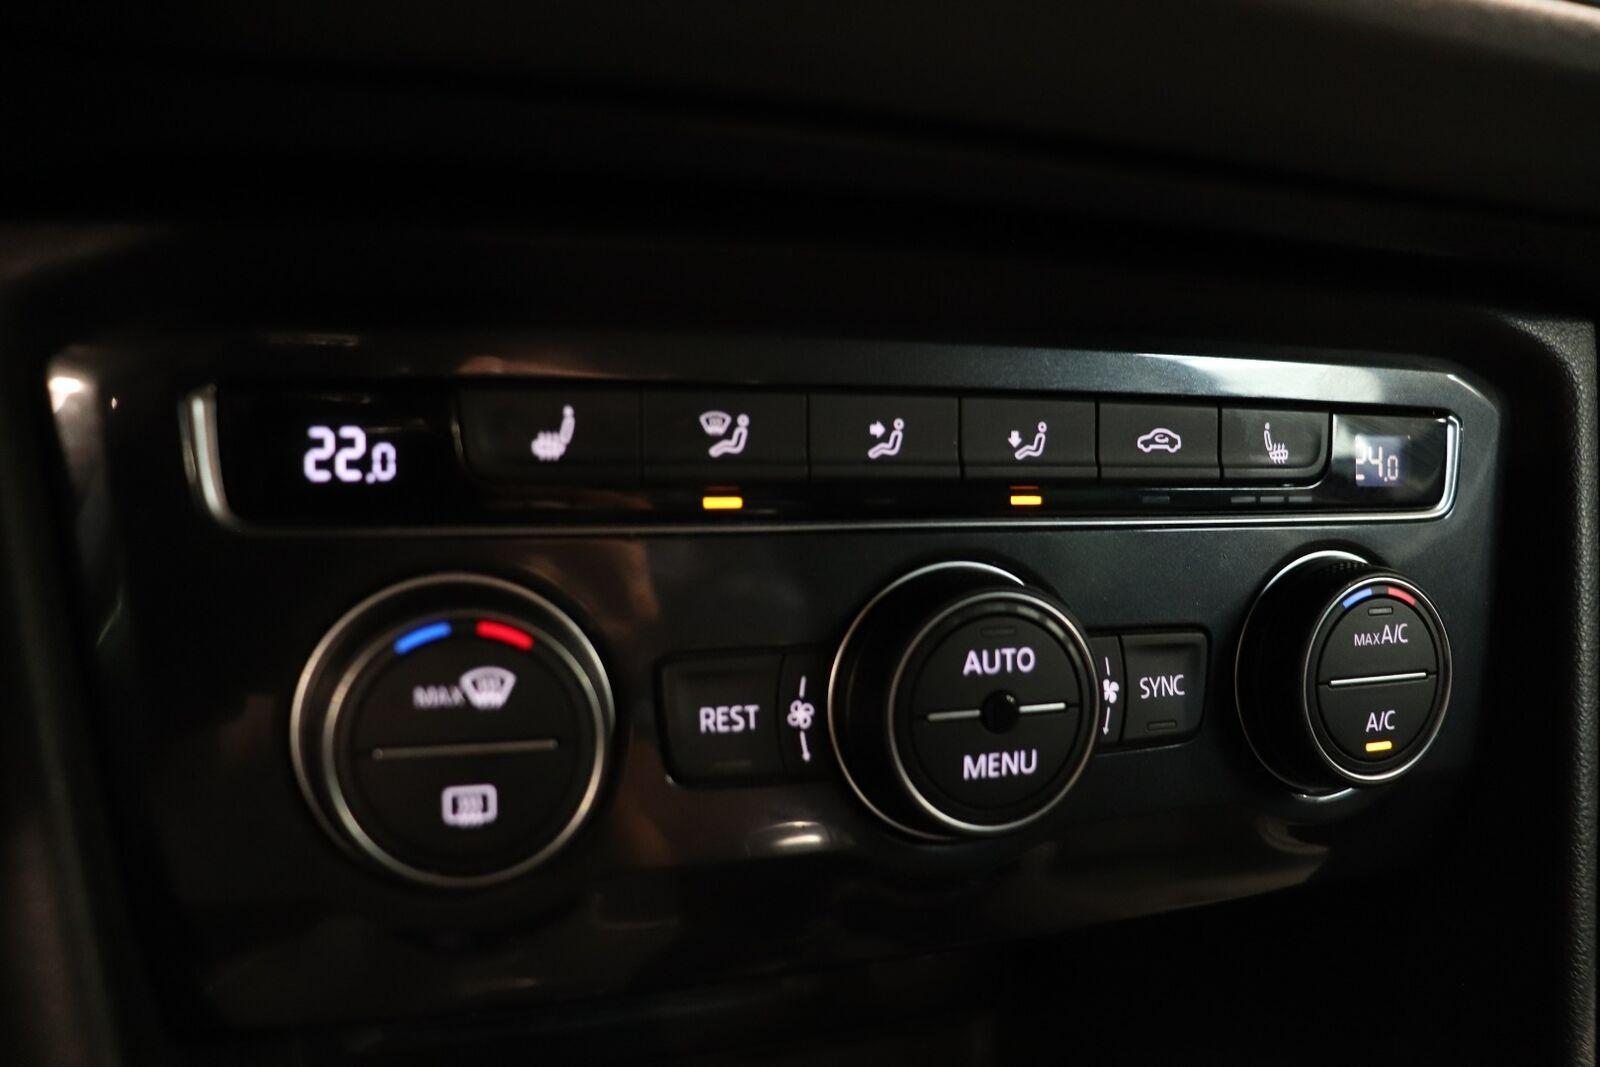 VW Tiguan TDi 150 Highline DSG